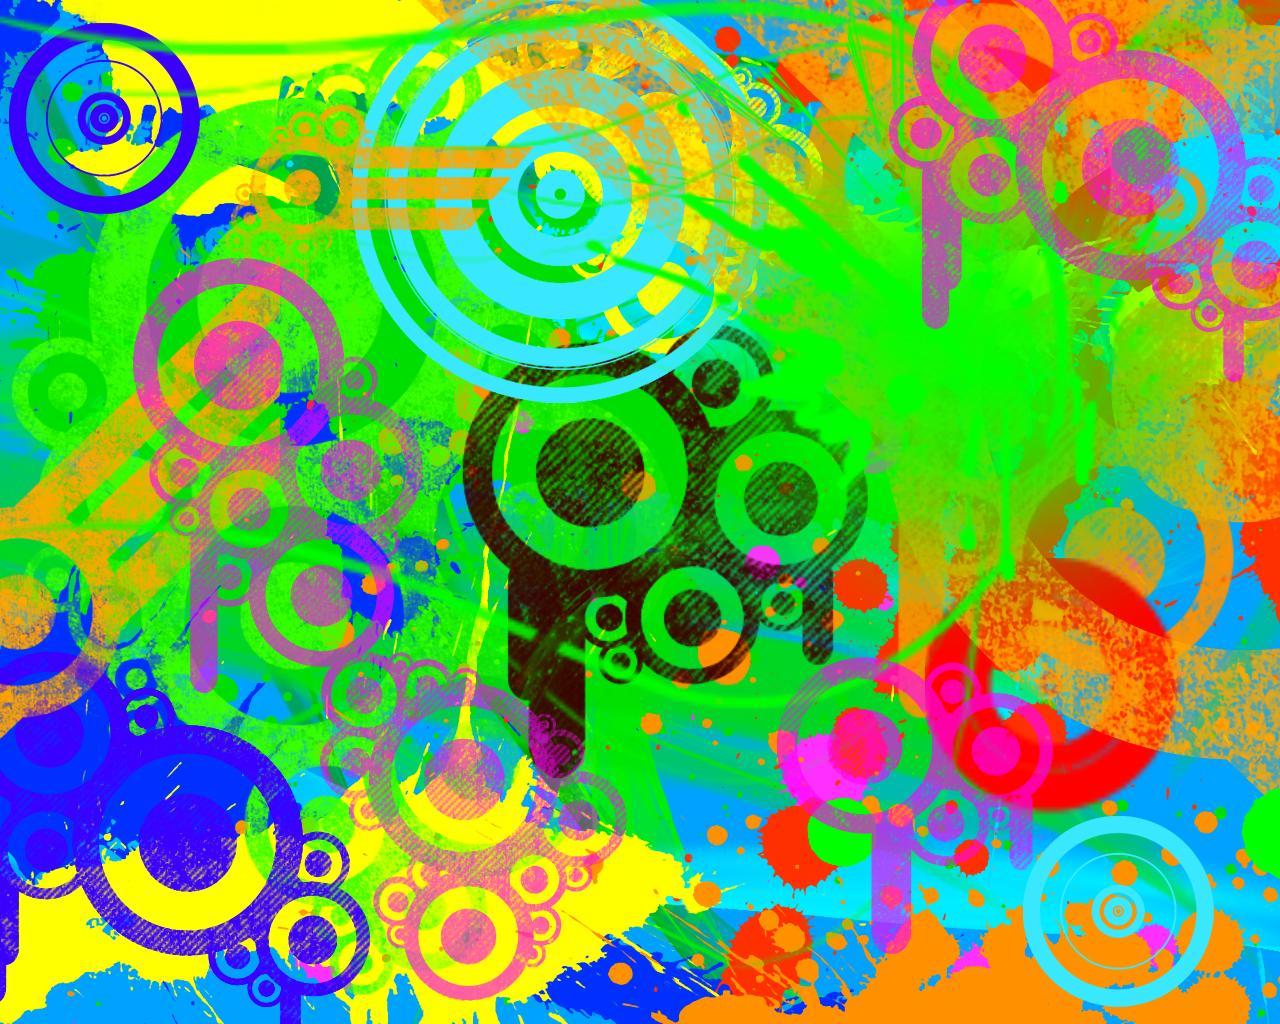 http://3.bp.blogspot.com/-7Lw3SXDvAy8/Ta9NDVm4jNI/AAAAAAAAHak/_O1AcMEC-jI/s1600/Funky+Retro.jpg